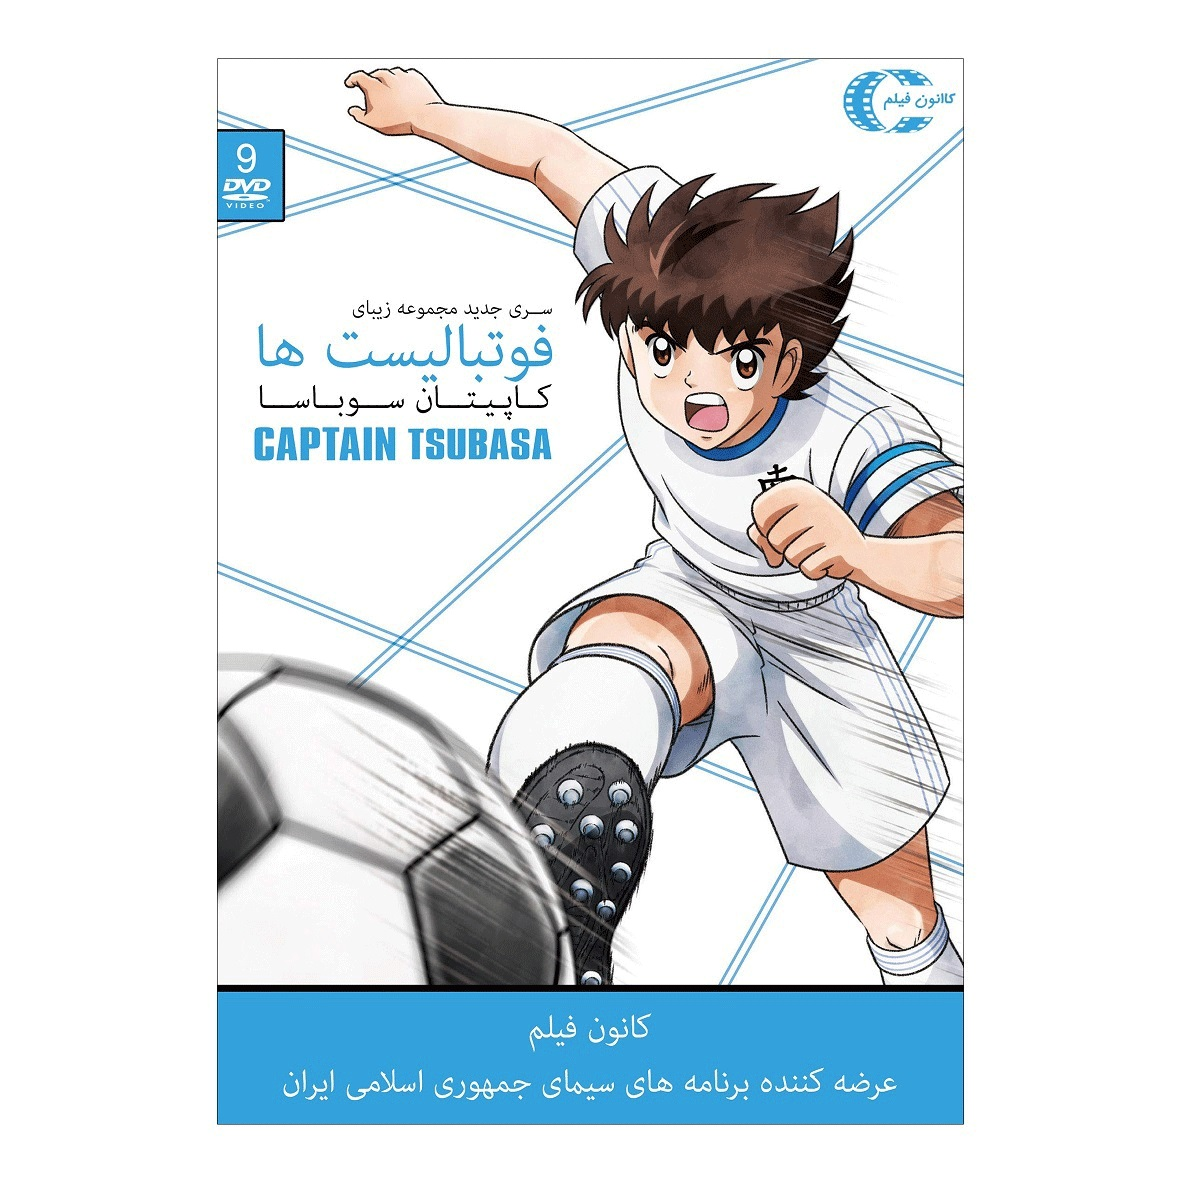 مجموعه کامل سریال فوتبالیستها کاپیتان سوباسا اثر یوئیچی تاکاهاشی